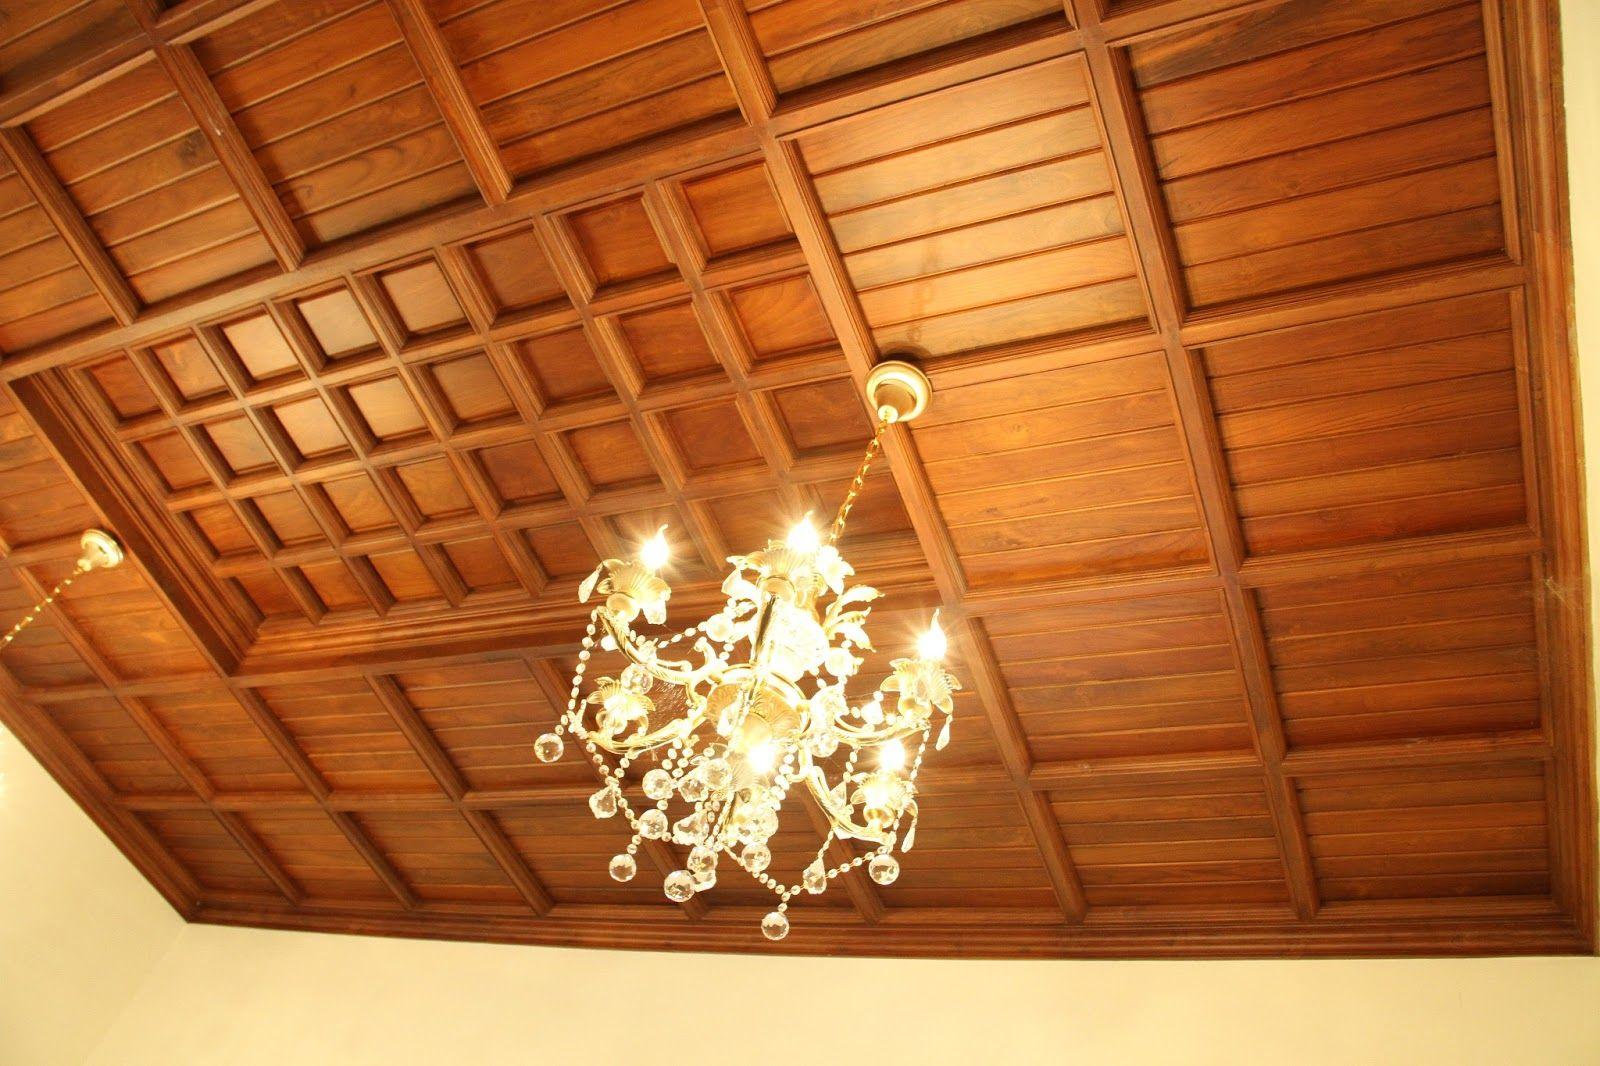 IMG_6559.JPG (1600×1066) | Wooden ceilings, False ceiling ...